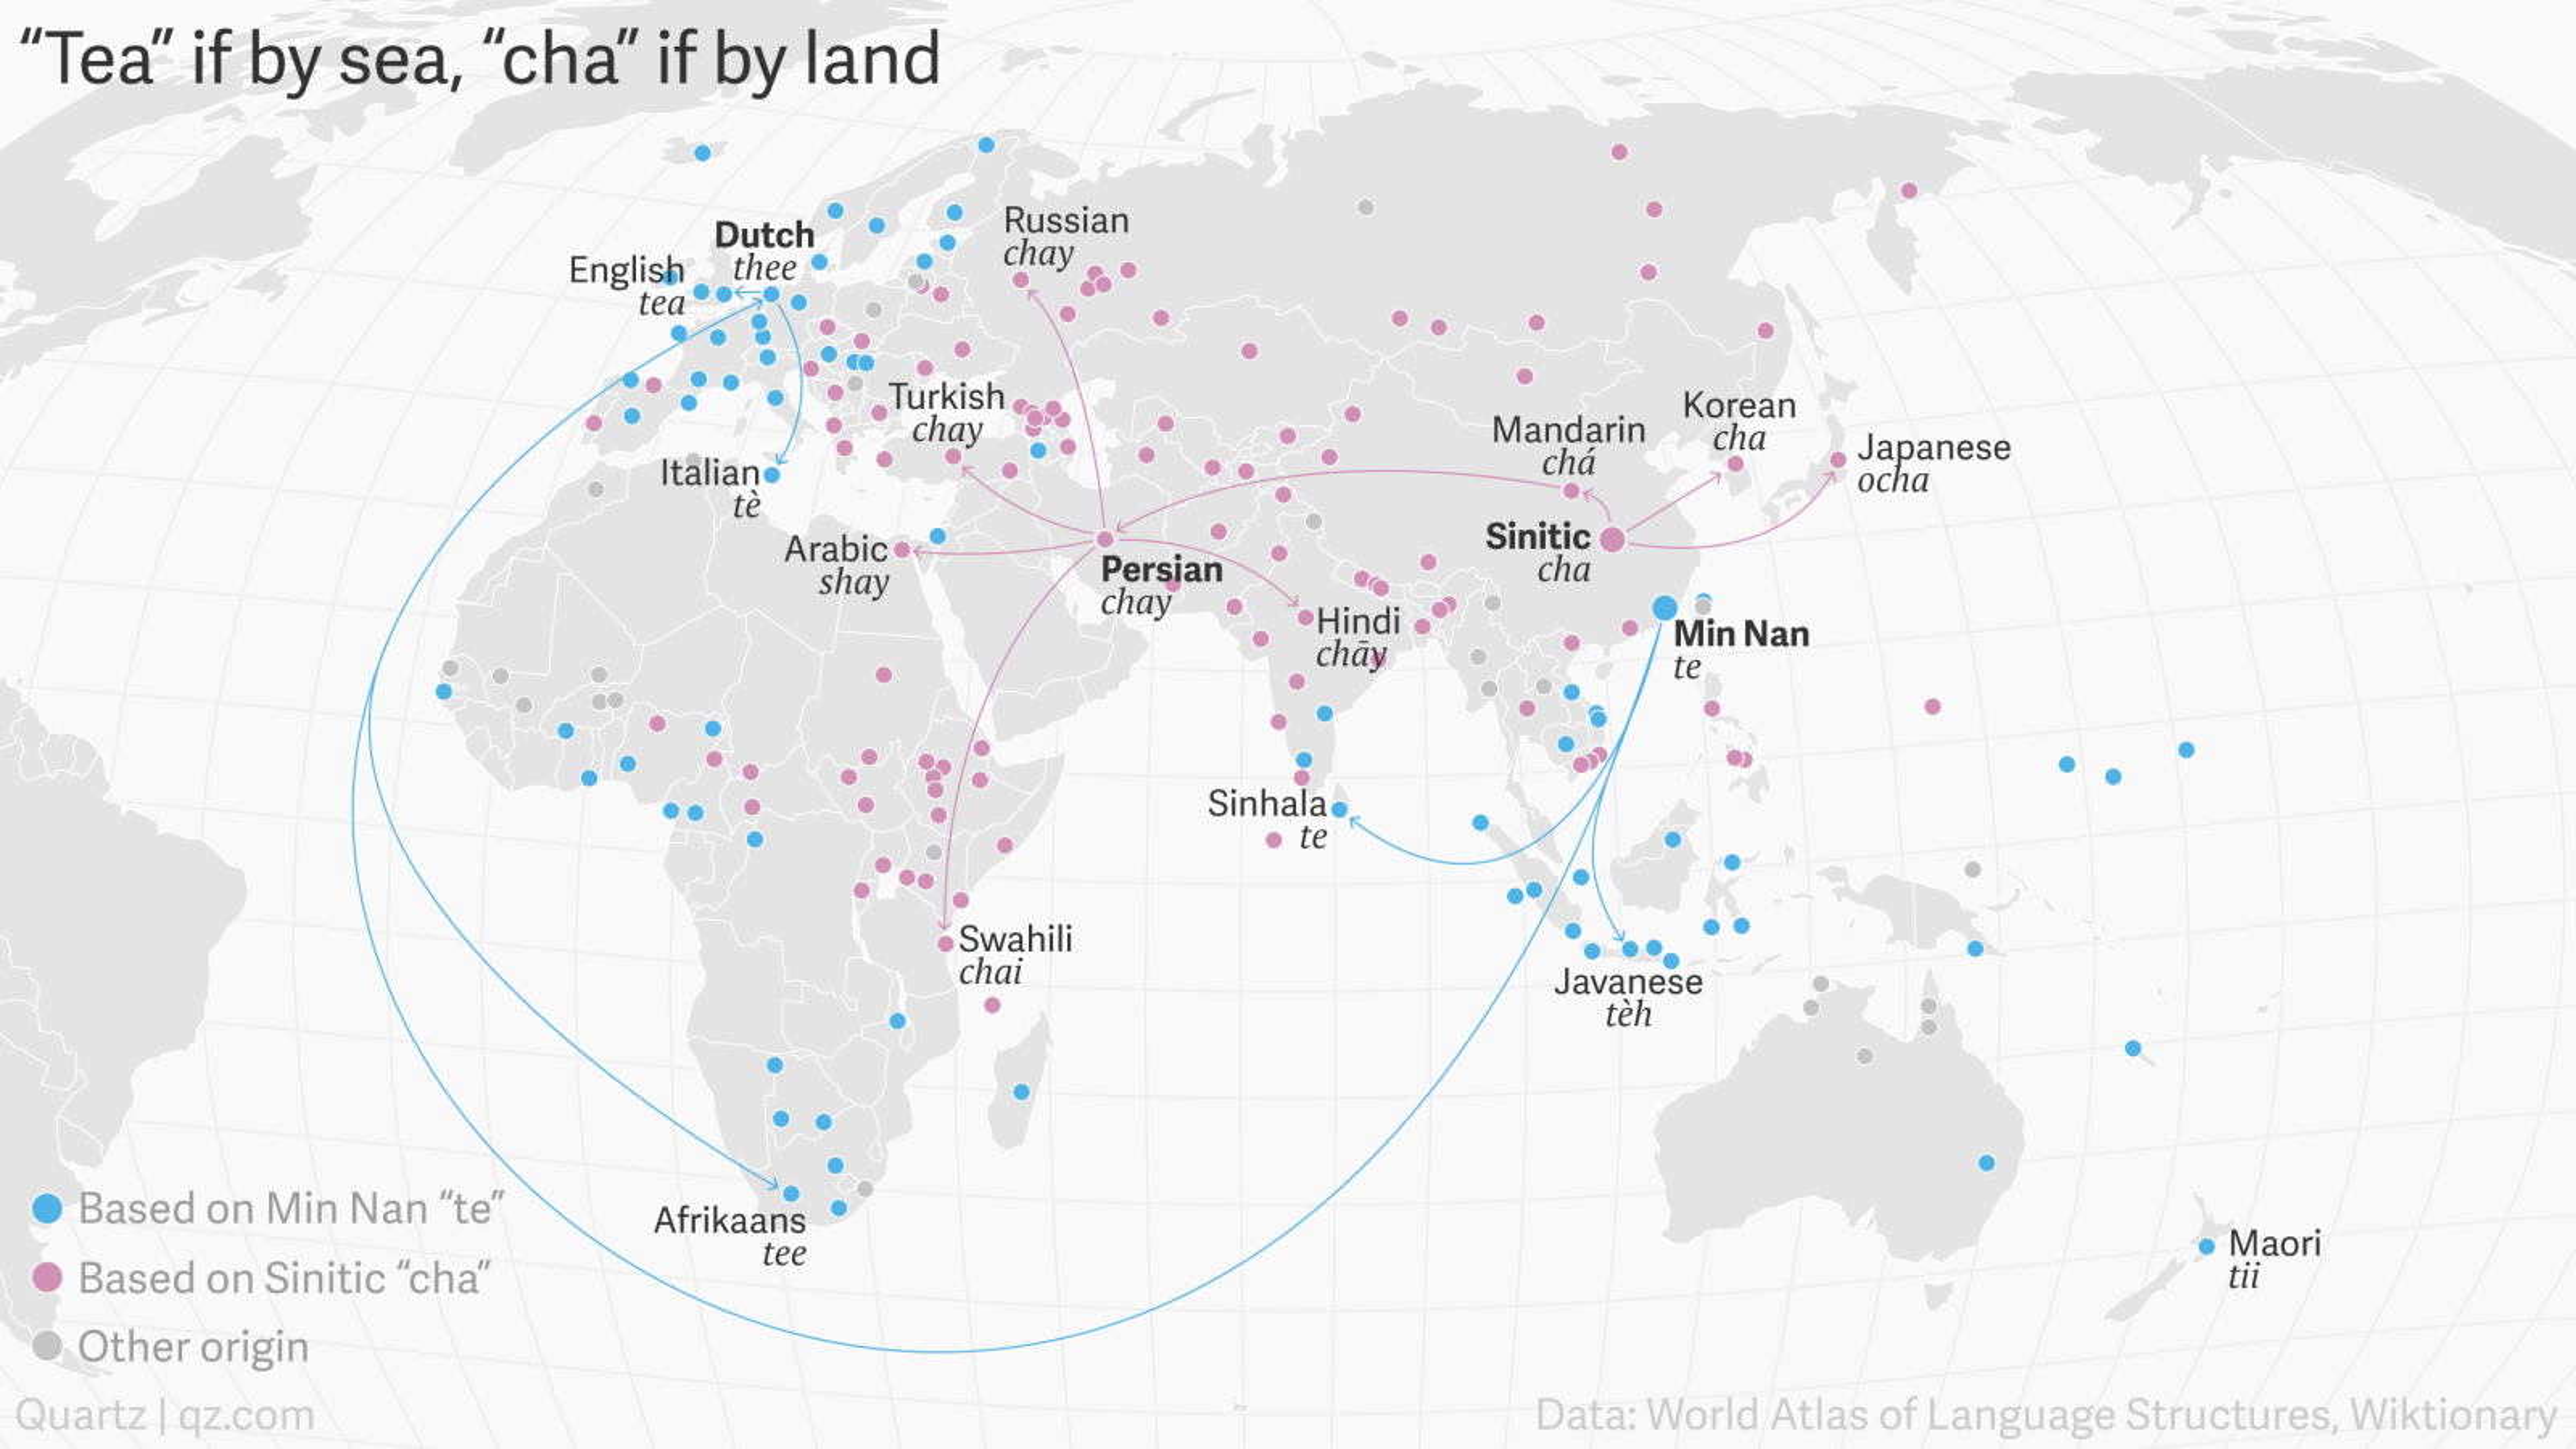 kaynak: https://cms.qz.com/wp-content/uploads/2018/01/tea-map.png?w=1600&h=900&crop=1&strip=all&quality=75